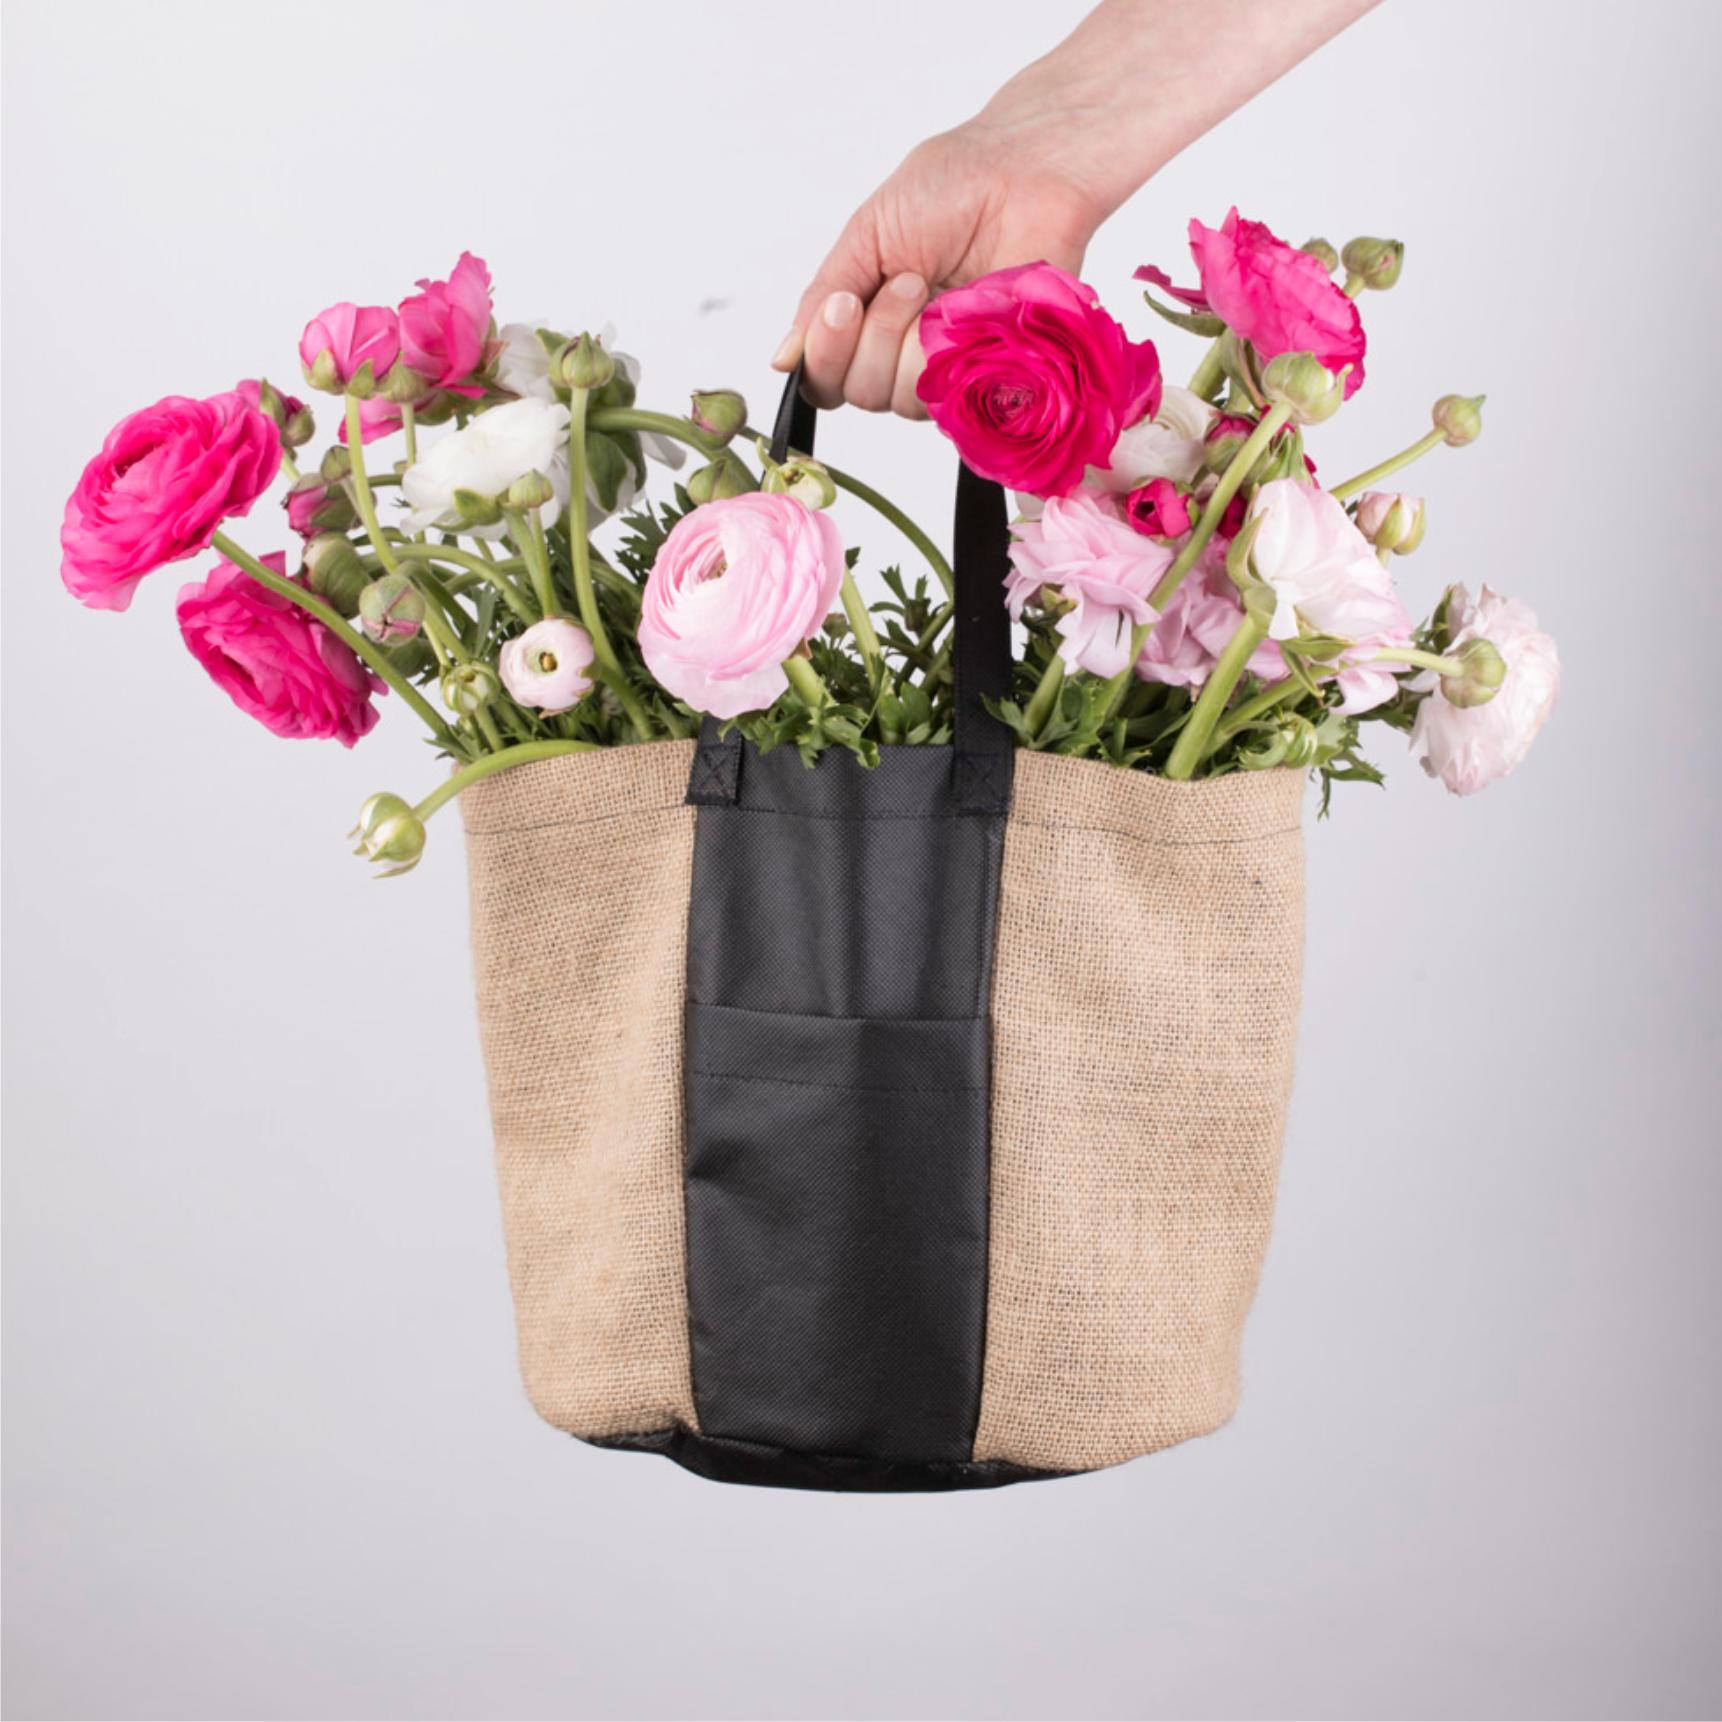 Ecotopia Bags & Accessories